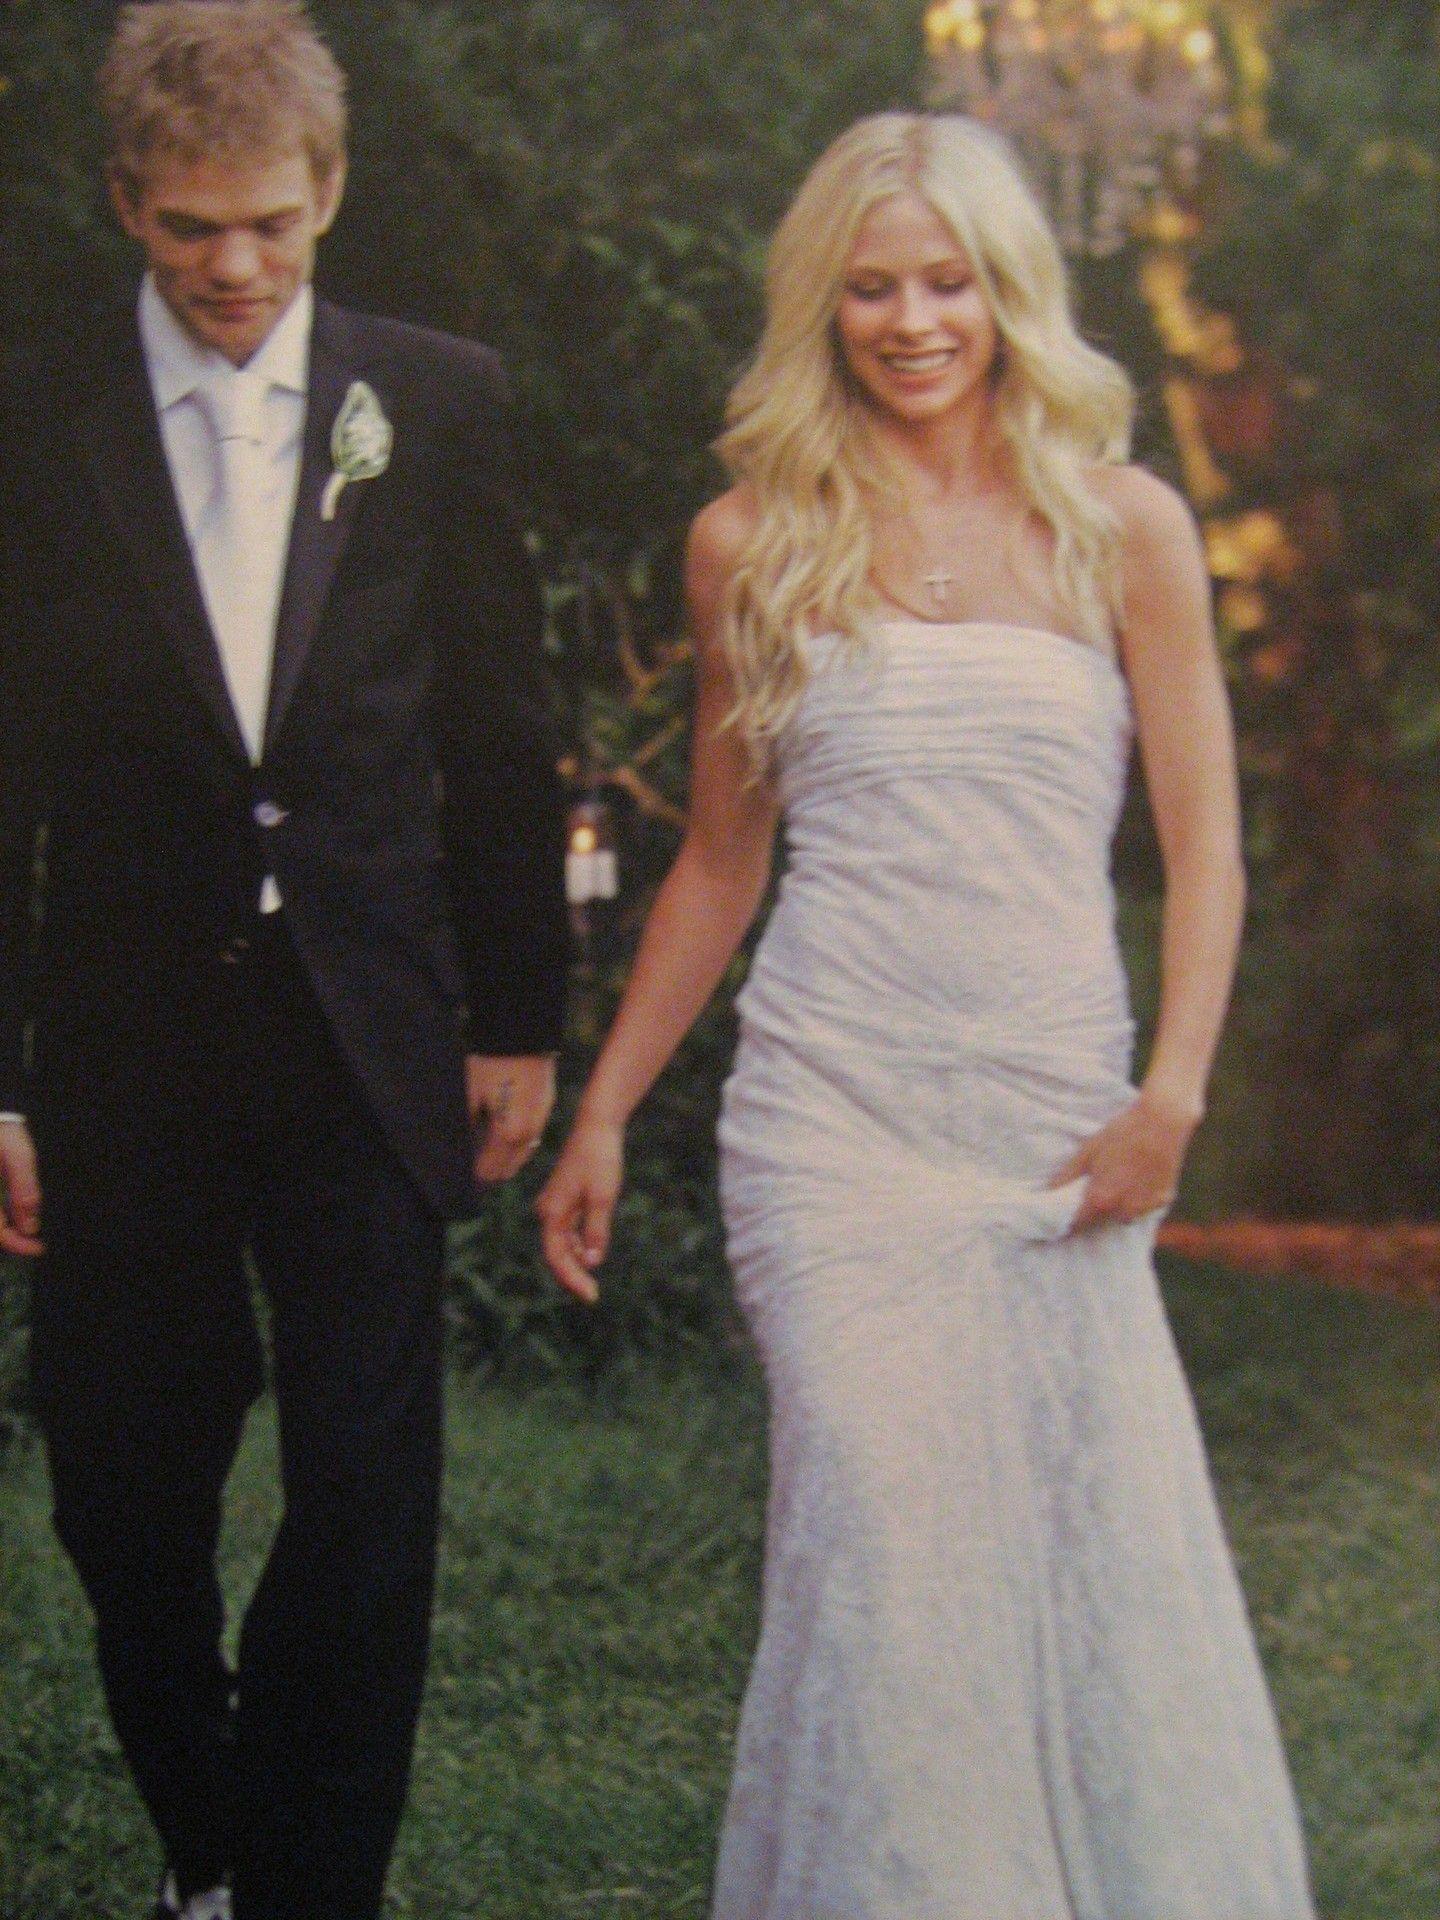 e0fba0a5de332 Avril Lavigne and Deryck Whibley's wedding (2006) Vera Wang Wedding Dress  Lace, Deryck. Read it